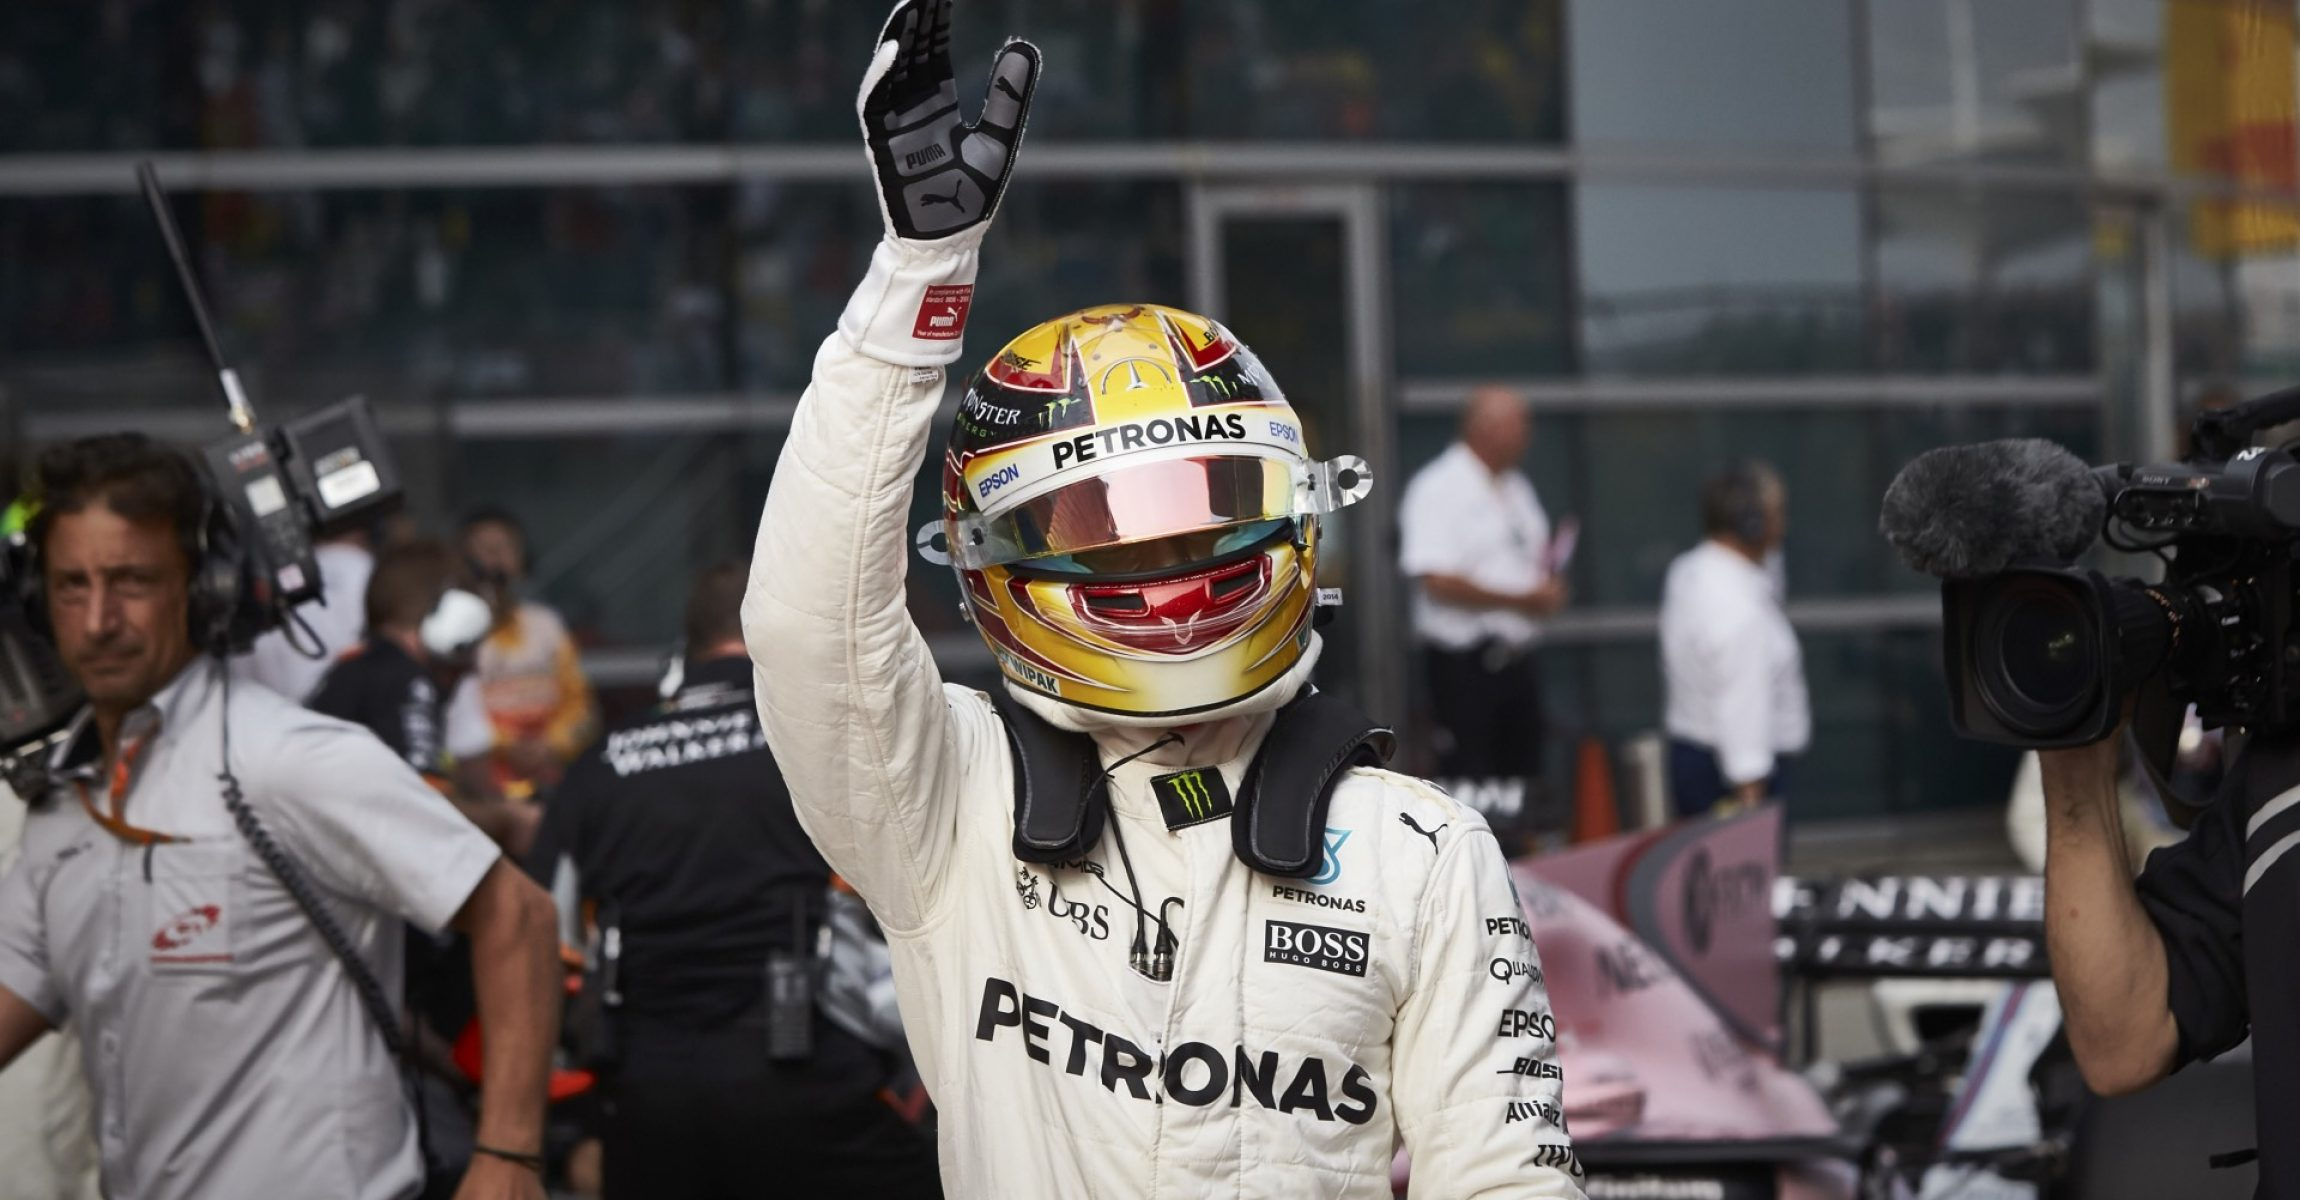 2017 Chinese Grand Prix, Saturday - Steve Etherington